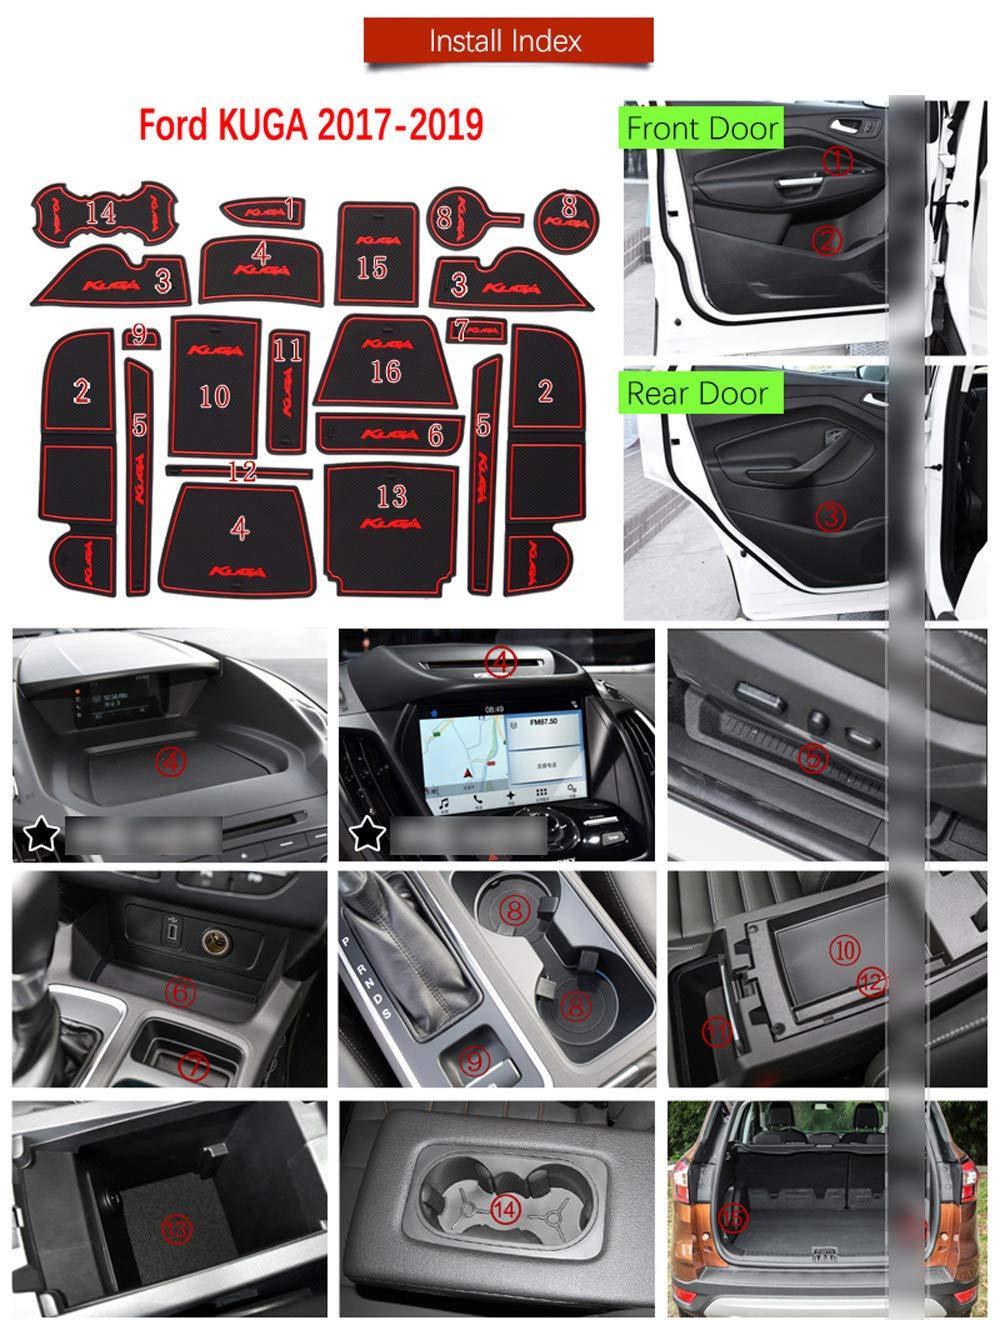 AniFM Slip Door Slot Gummi Latex Slot Innenraum Staubpolster Kissen forFord KUGA 2017 2018 2019 Ford Escape MK2 Auto Aufkleber 21 Pc 1 Set,Blue